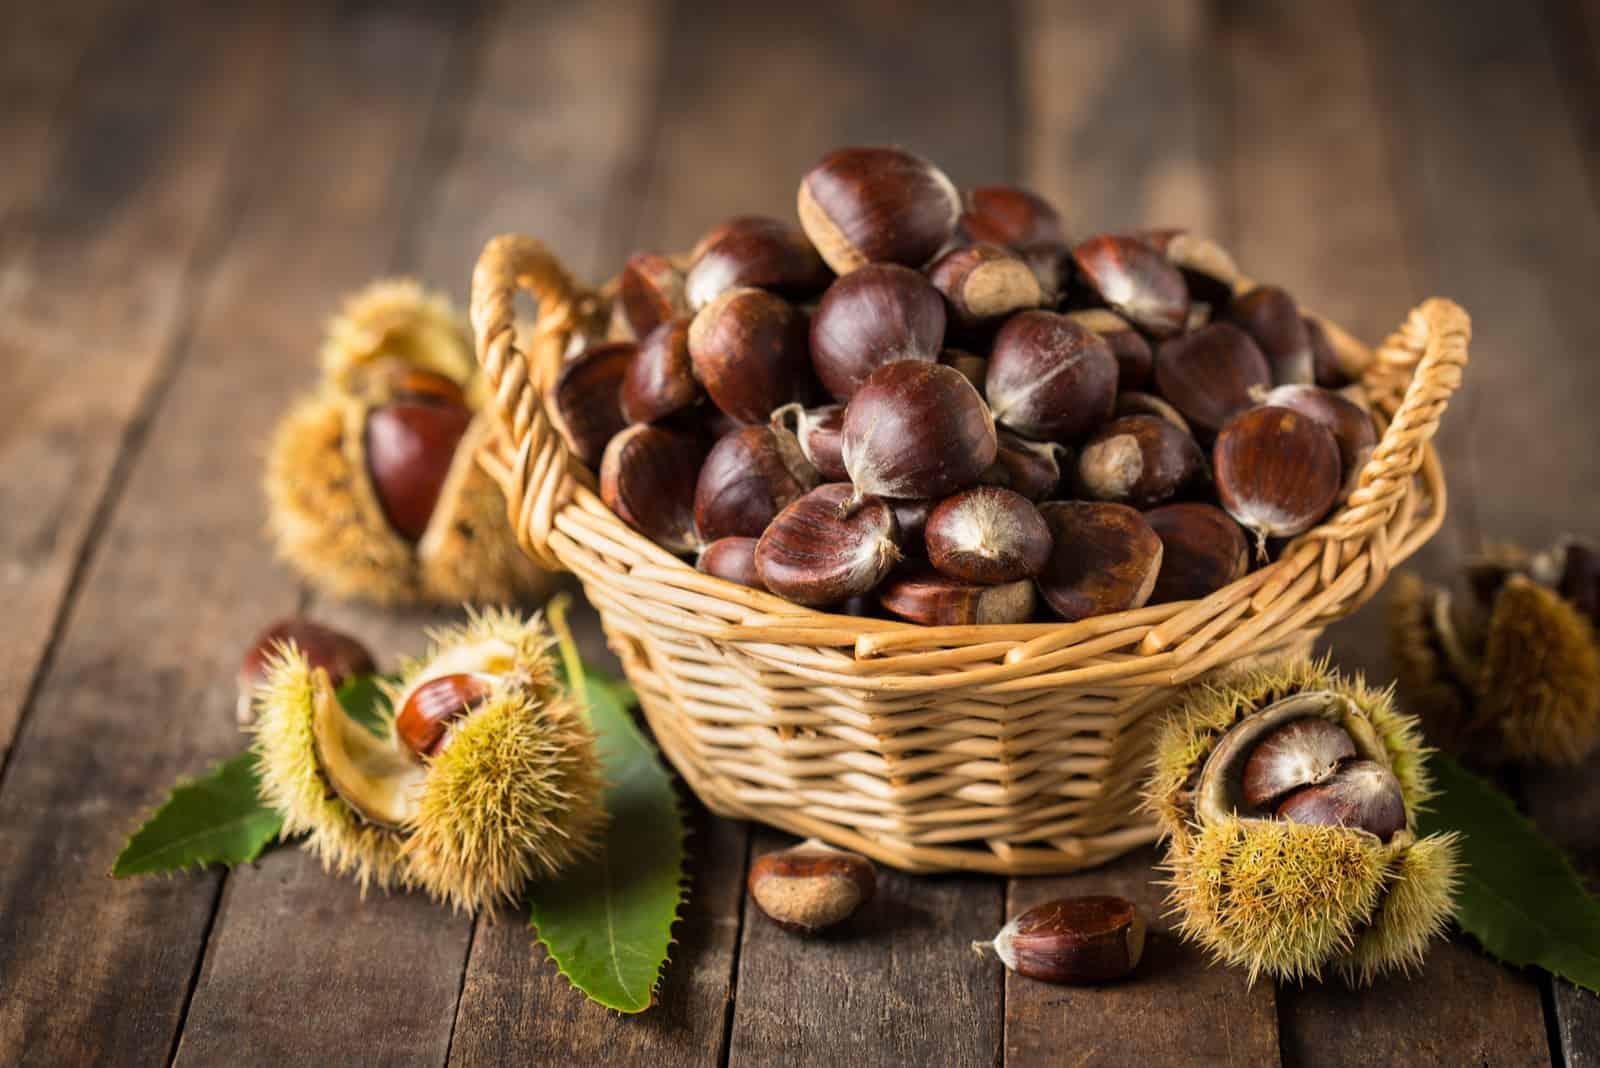 chestnuts in a wicker bowl